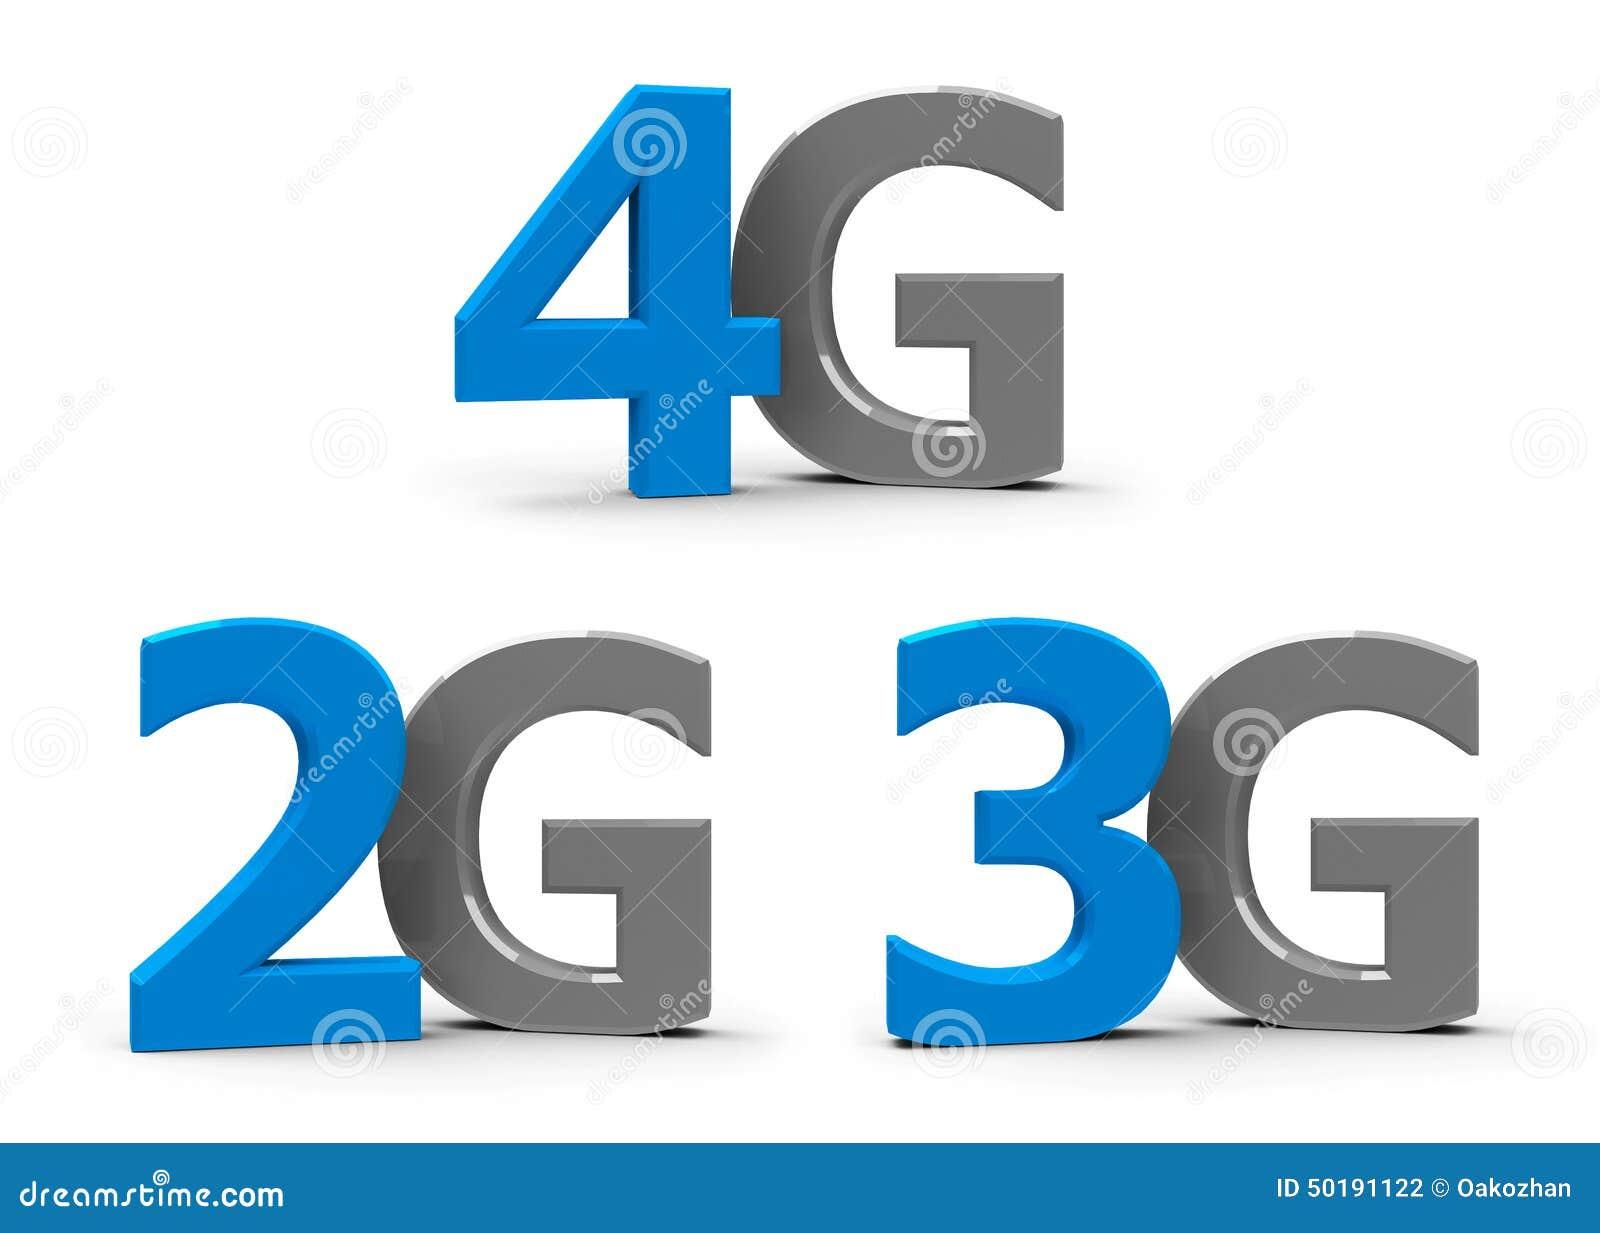 2g 3g 4g icons stock illustration   image 50191122